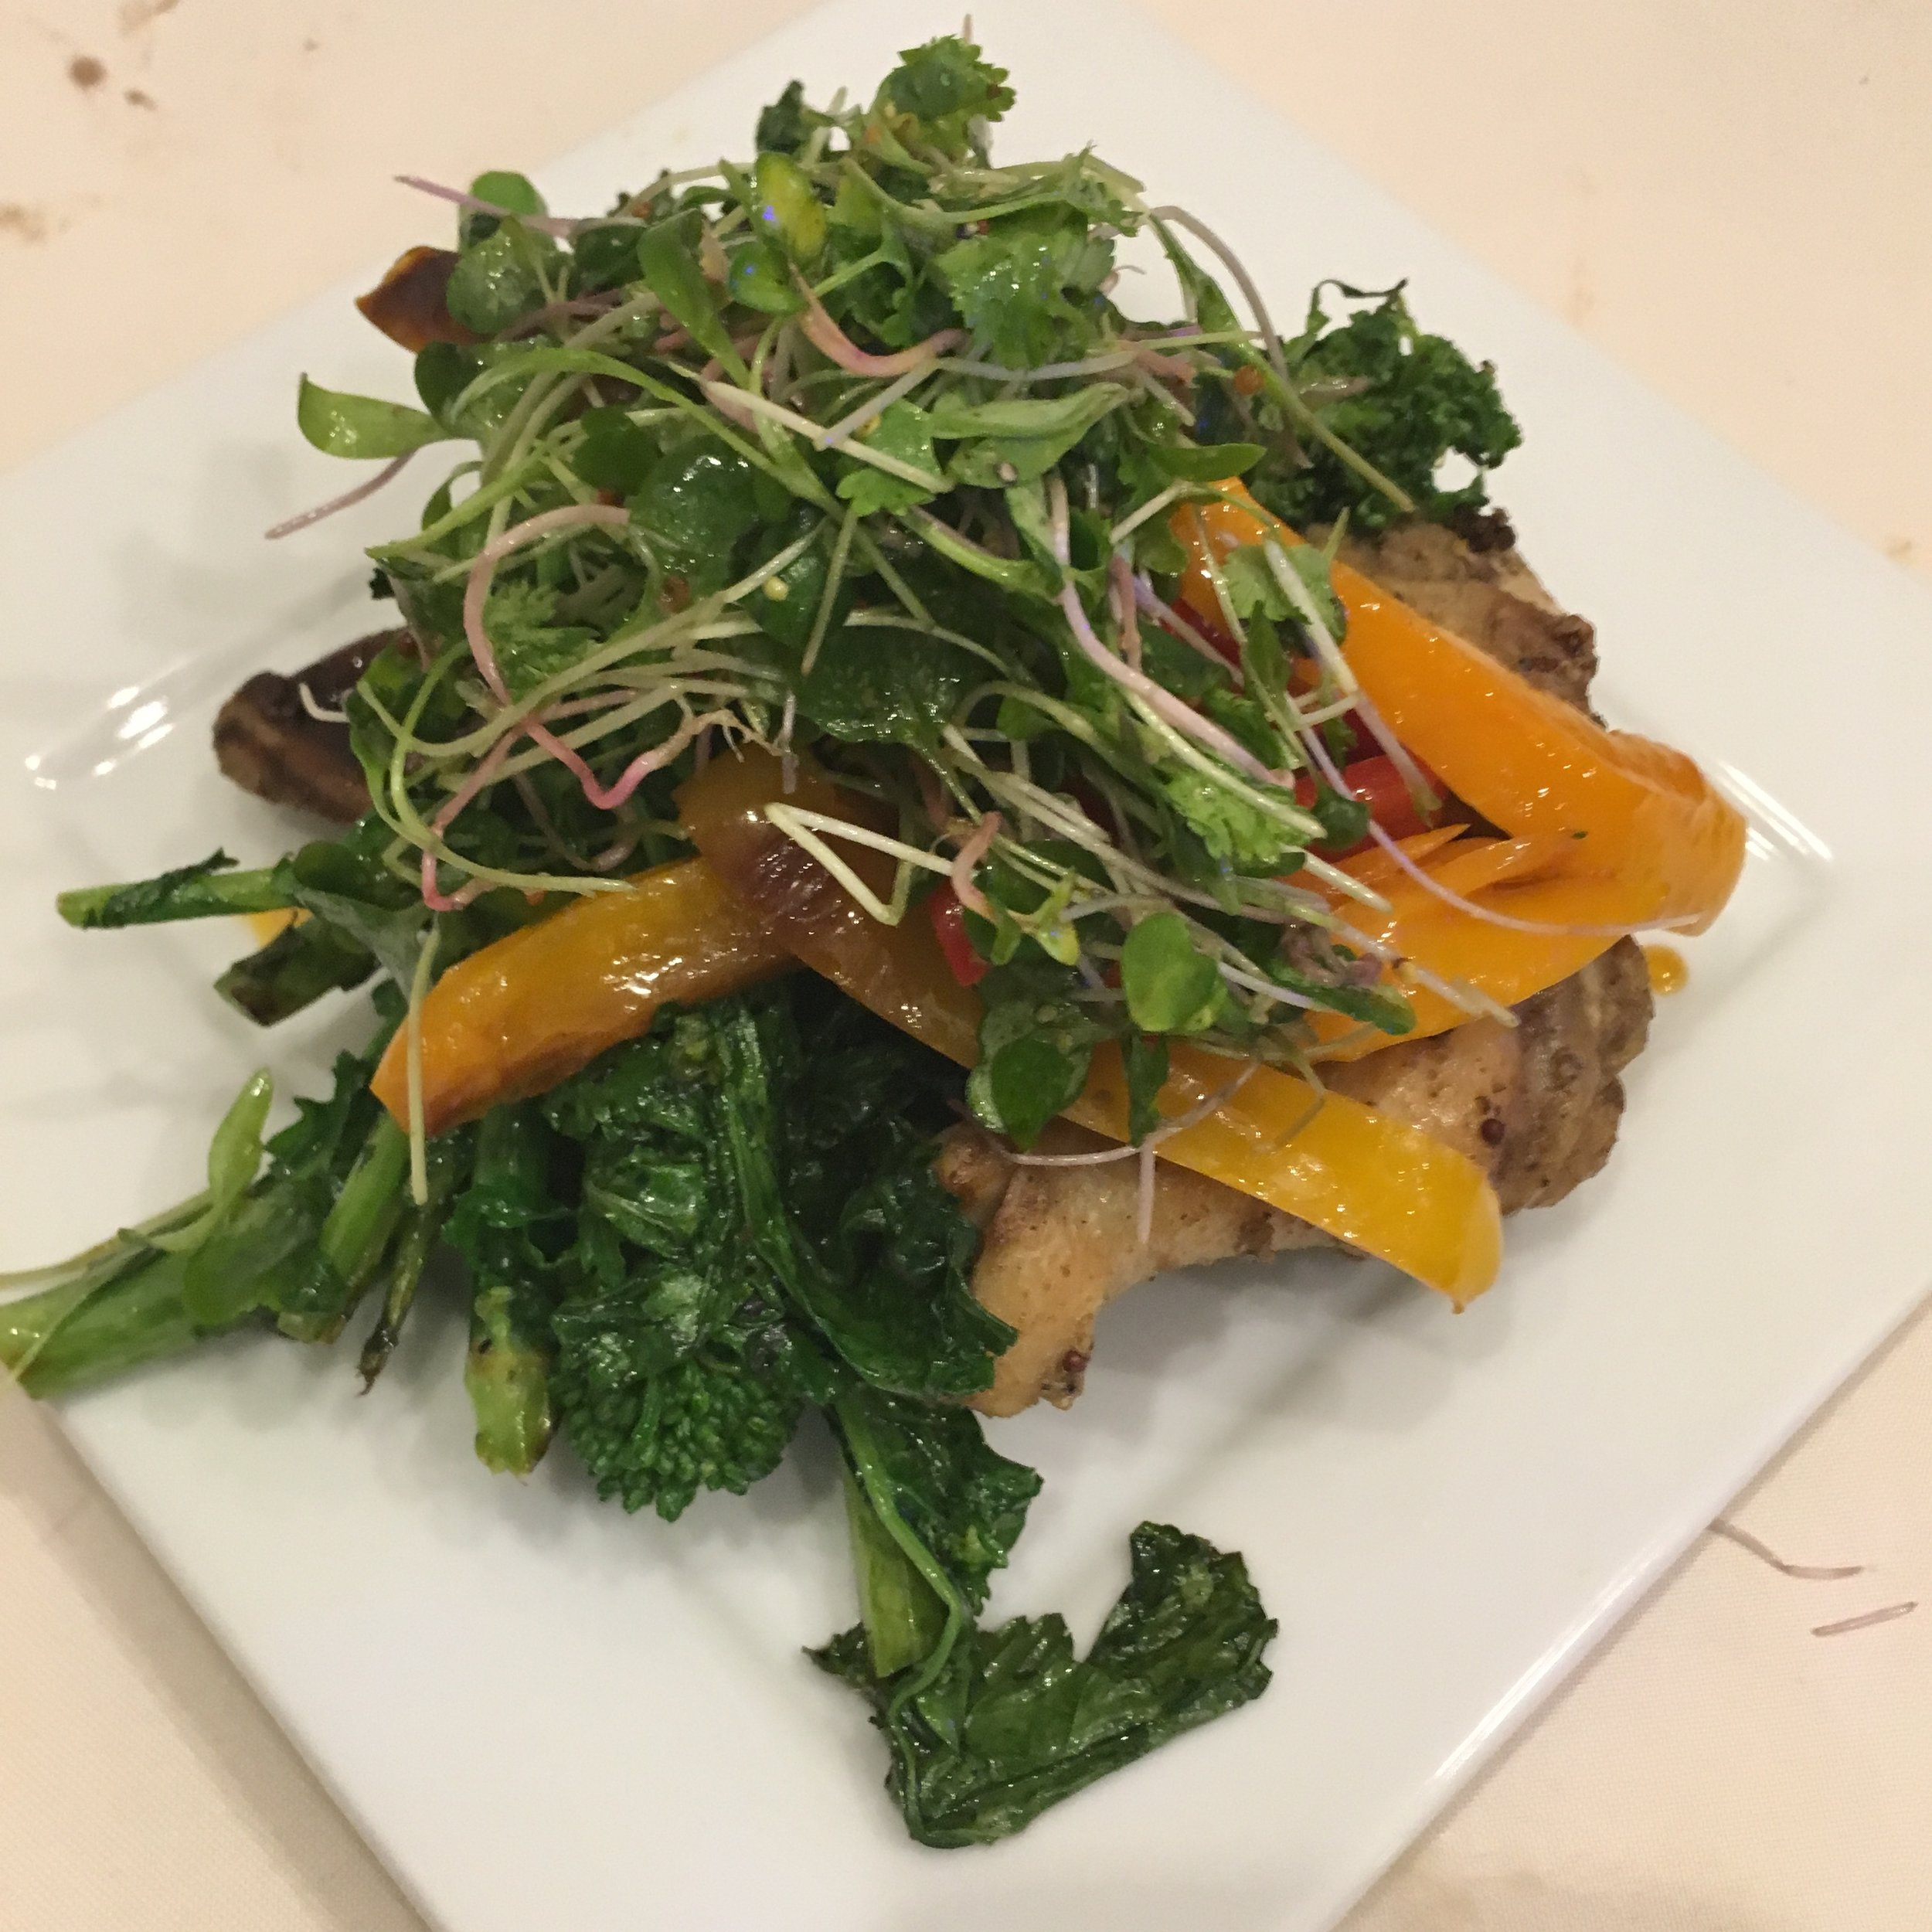 Airline Chicken Breast W Broccoli Rabe & Radish sprouts